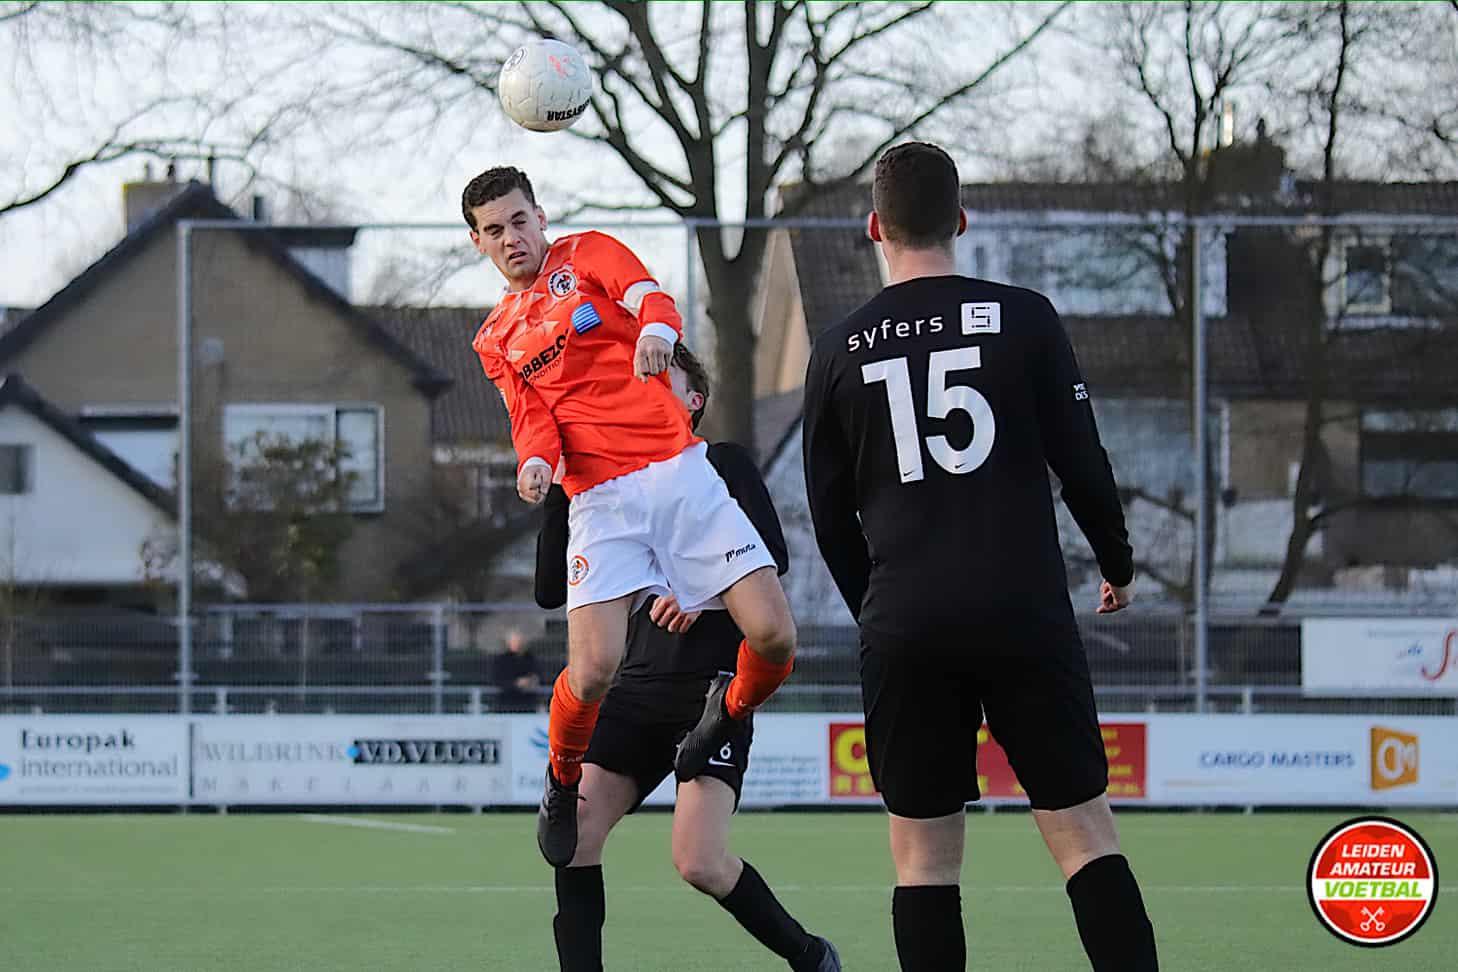 Foto's Kagia - Soccer Boys (01/02/2020)